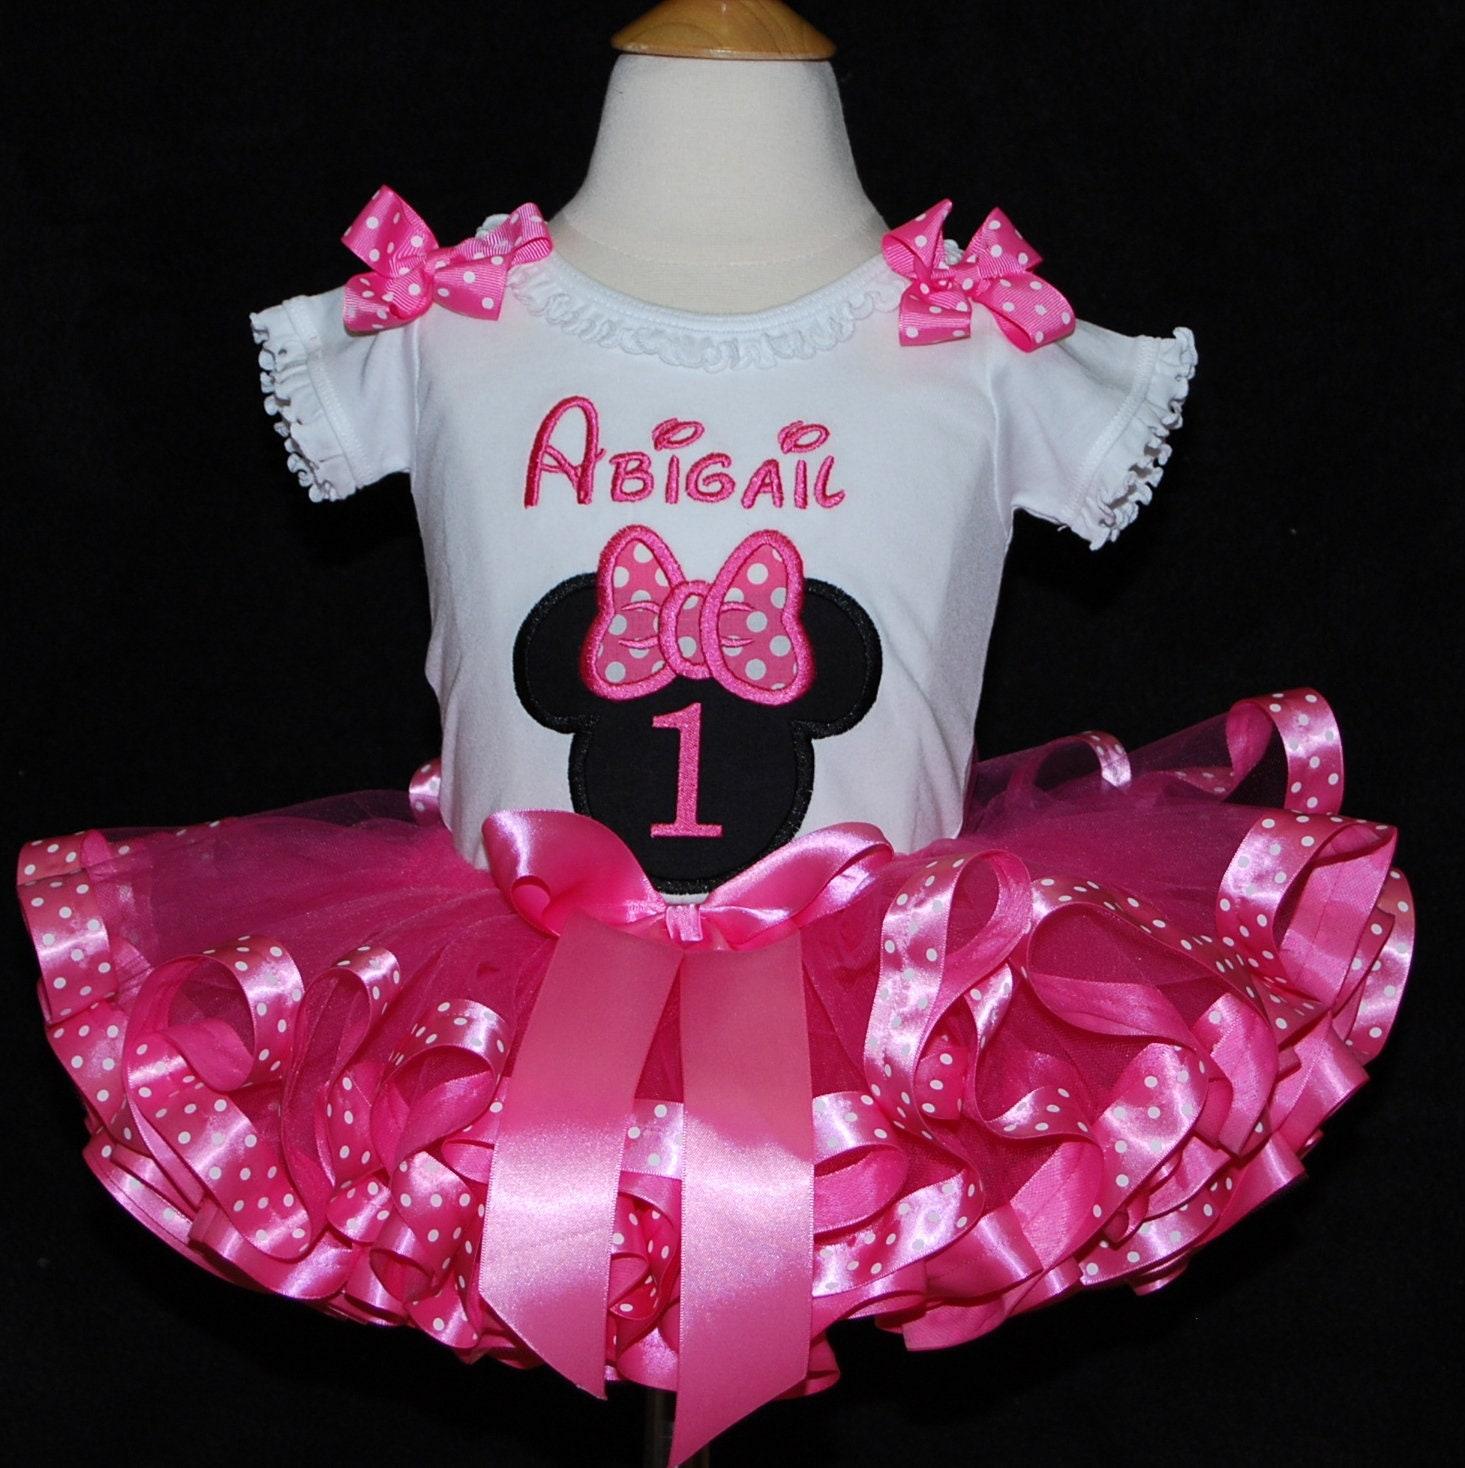 minnie mouse birthday outfit birthday tutu outfit personalized minnie mouse birthday shirt cake smash outfit minnie mouse tutu dress pink